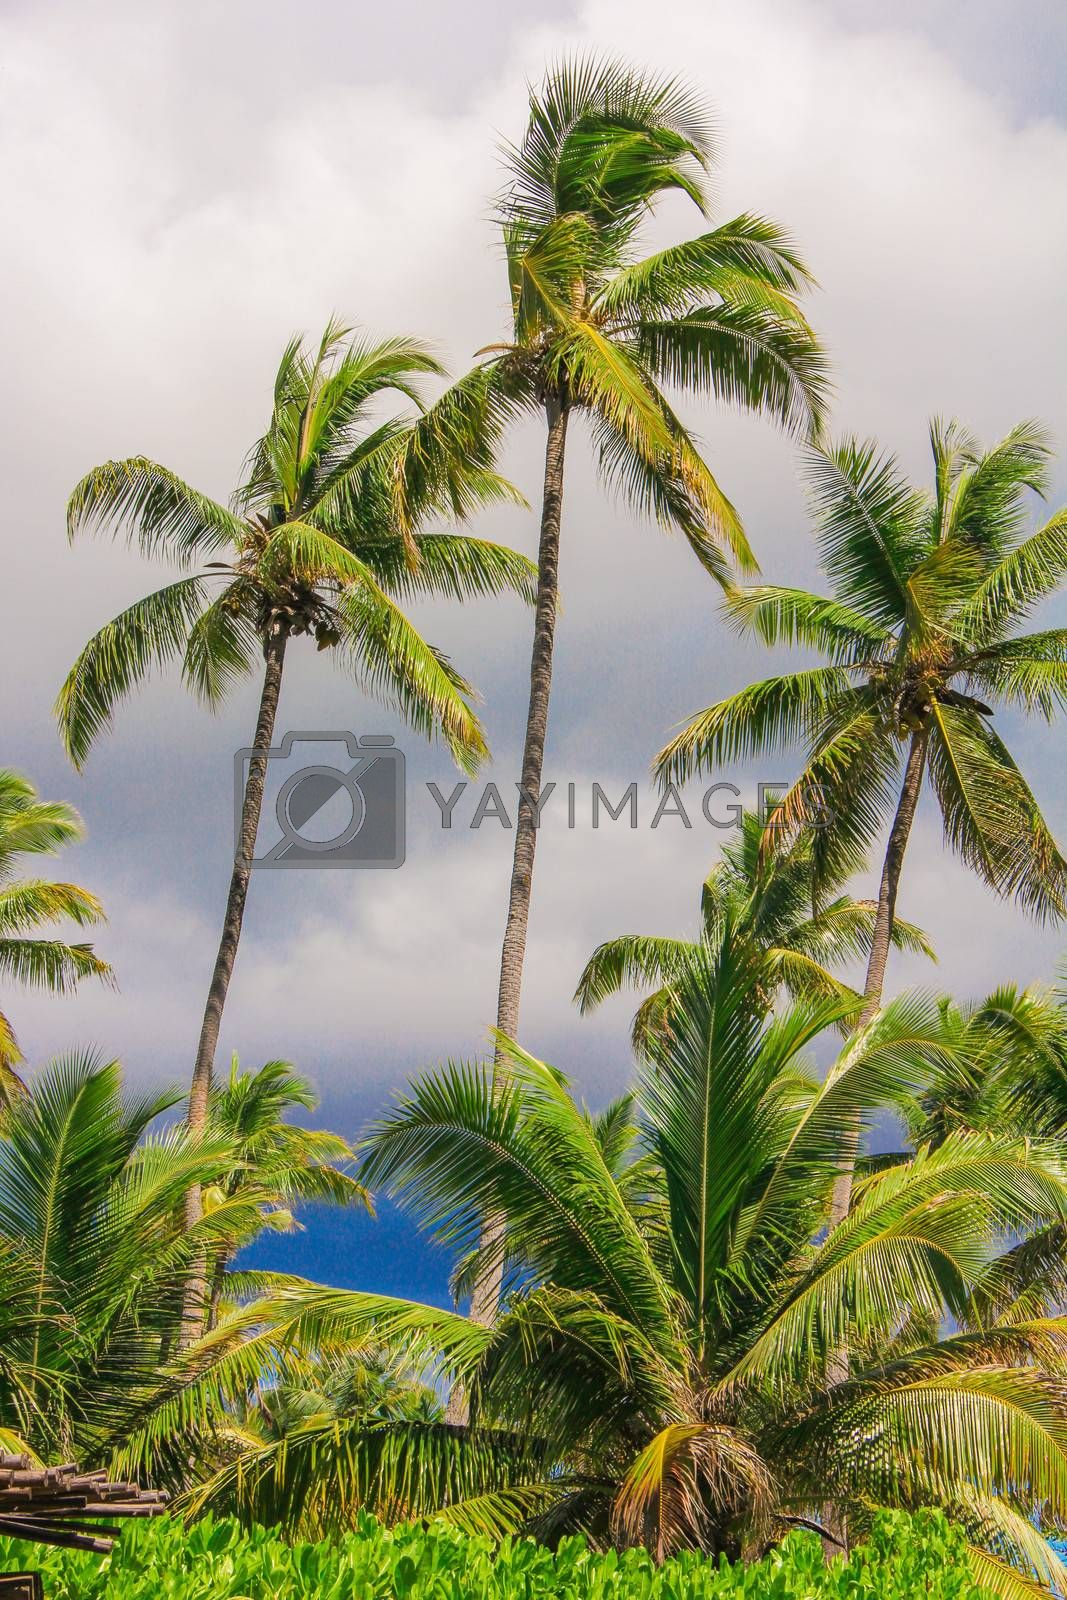 Palm tree on the sandy beach in Seyshelles